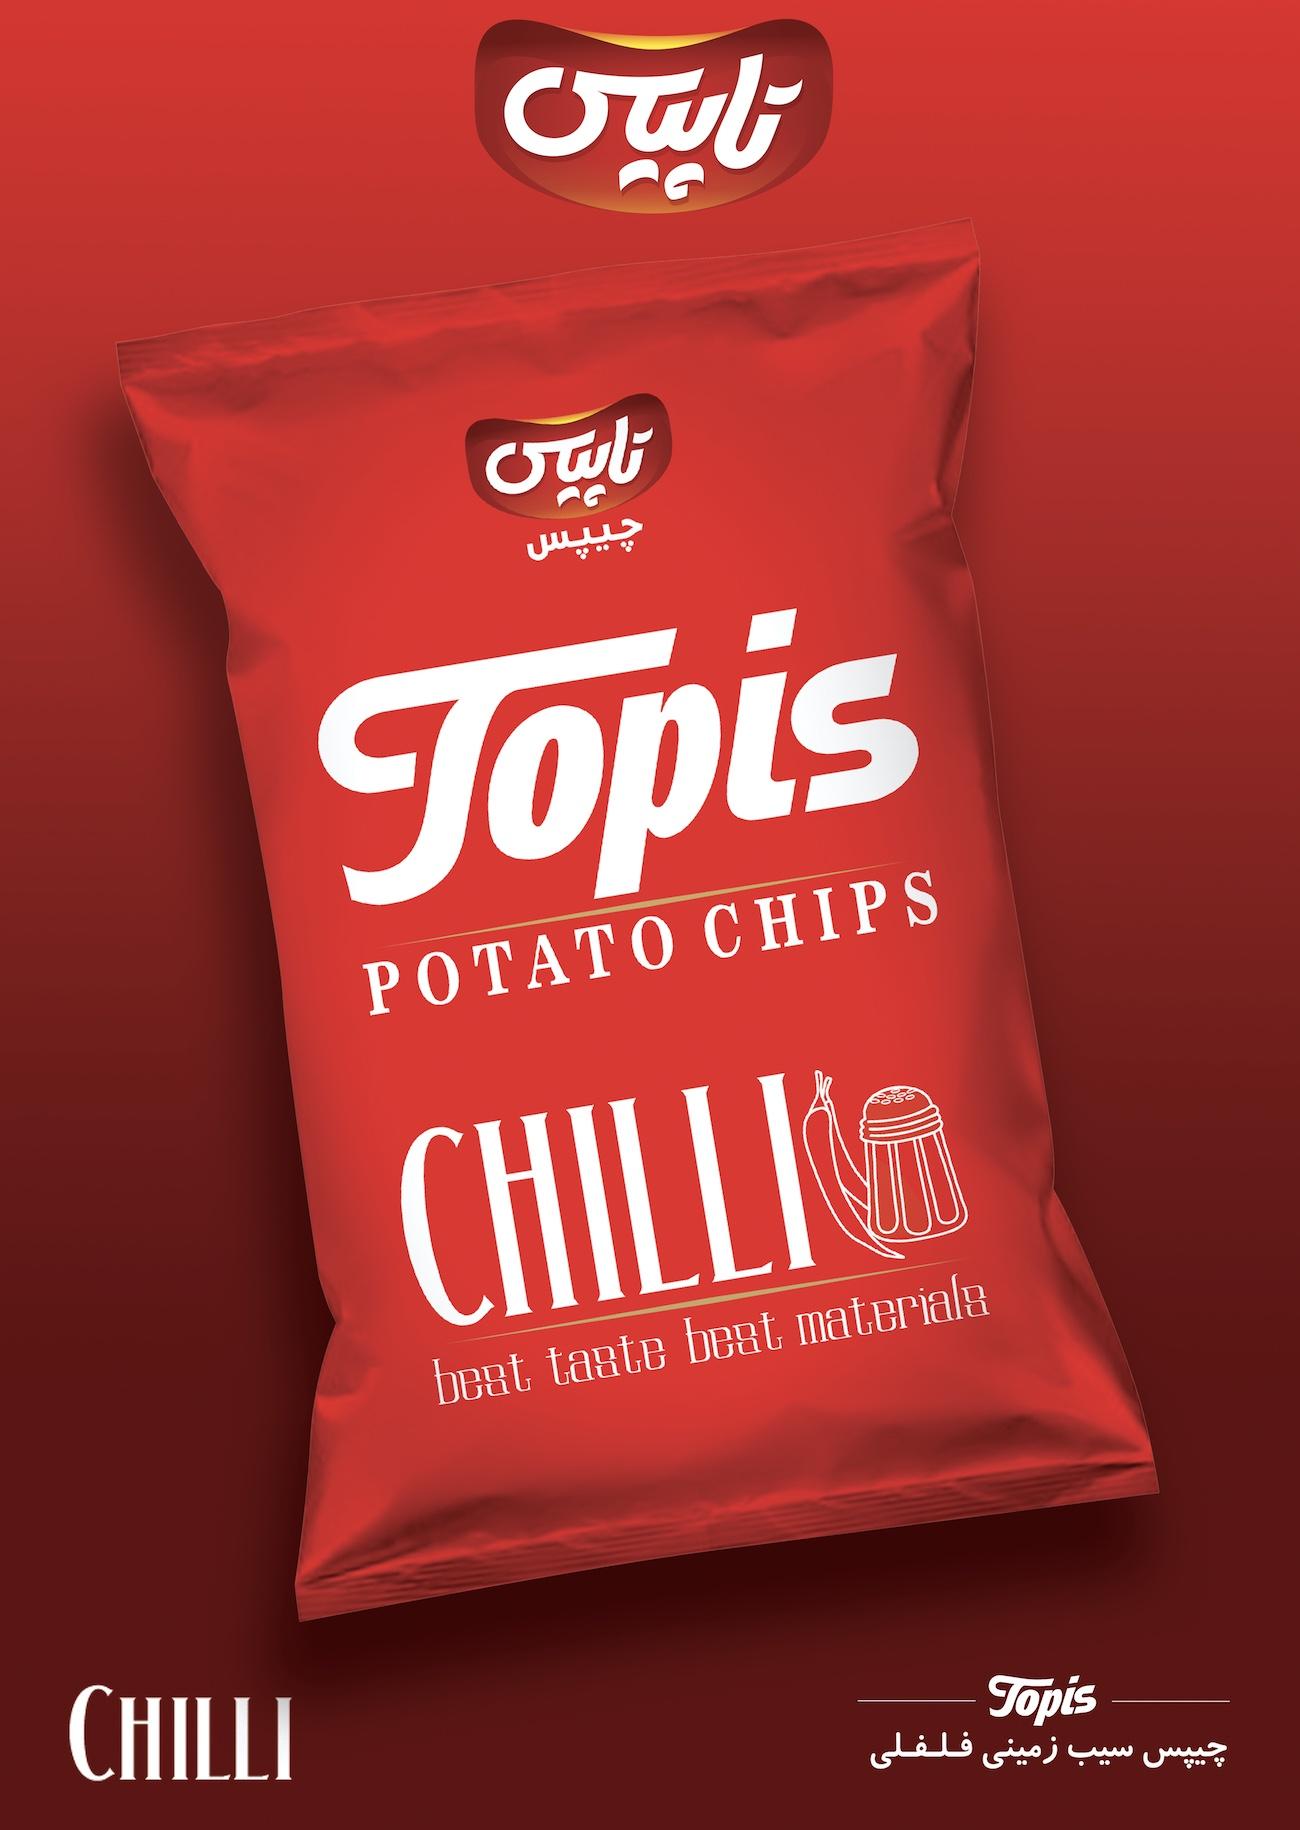 ChiliChips